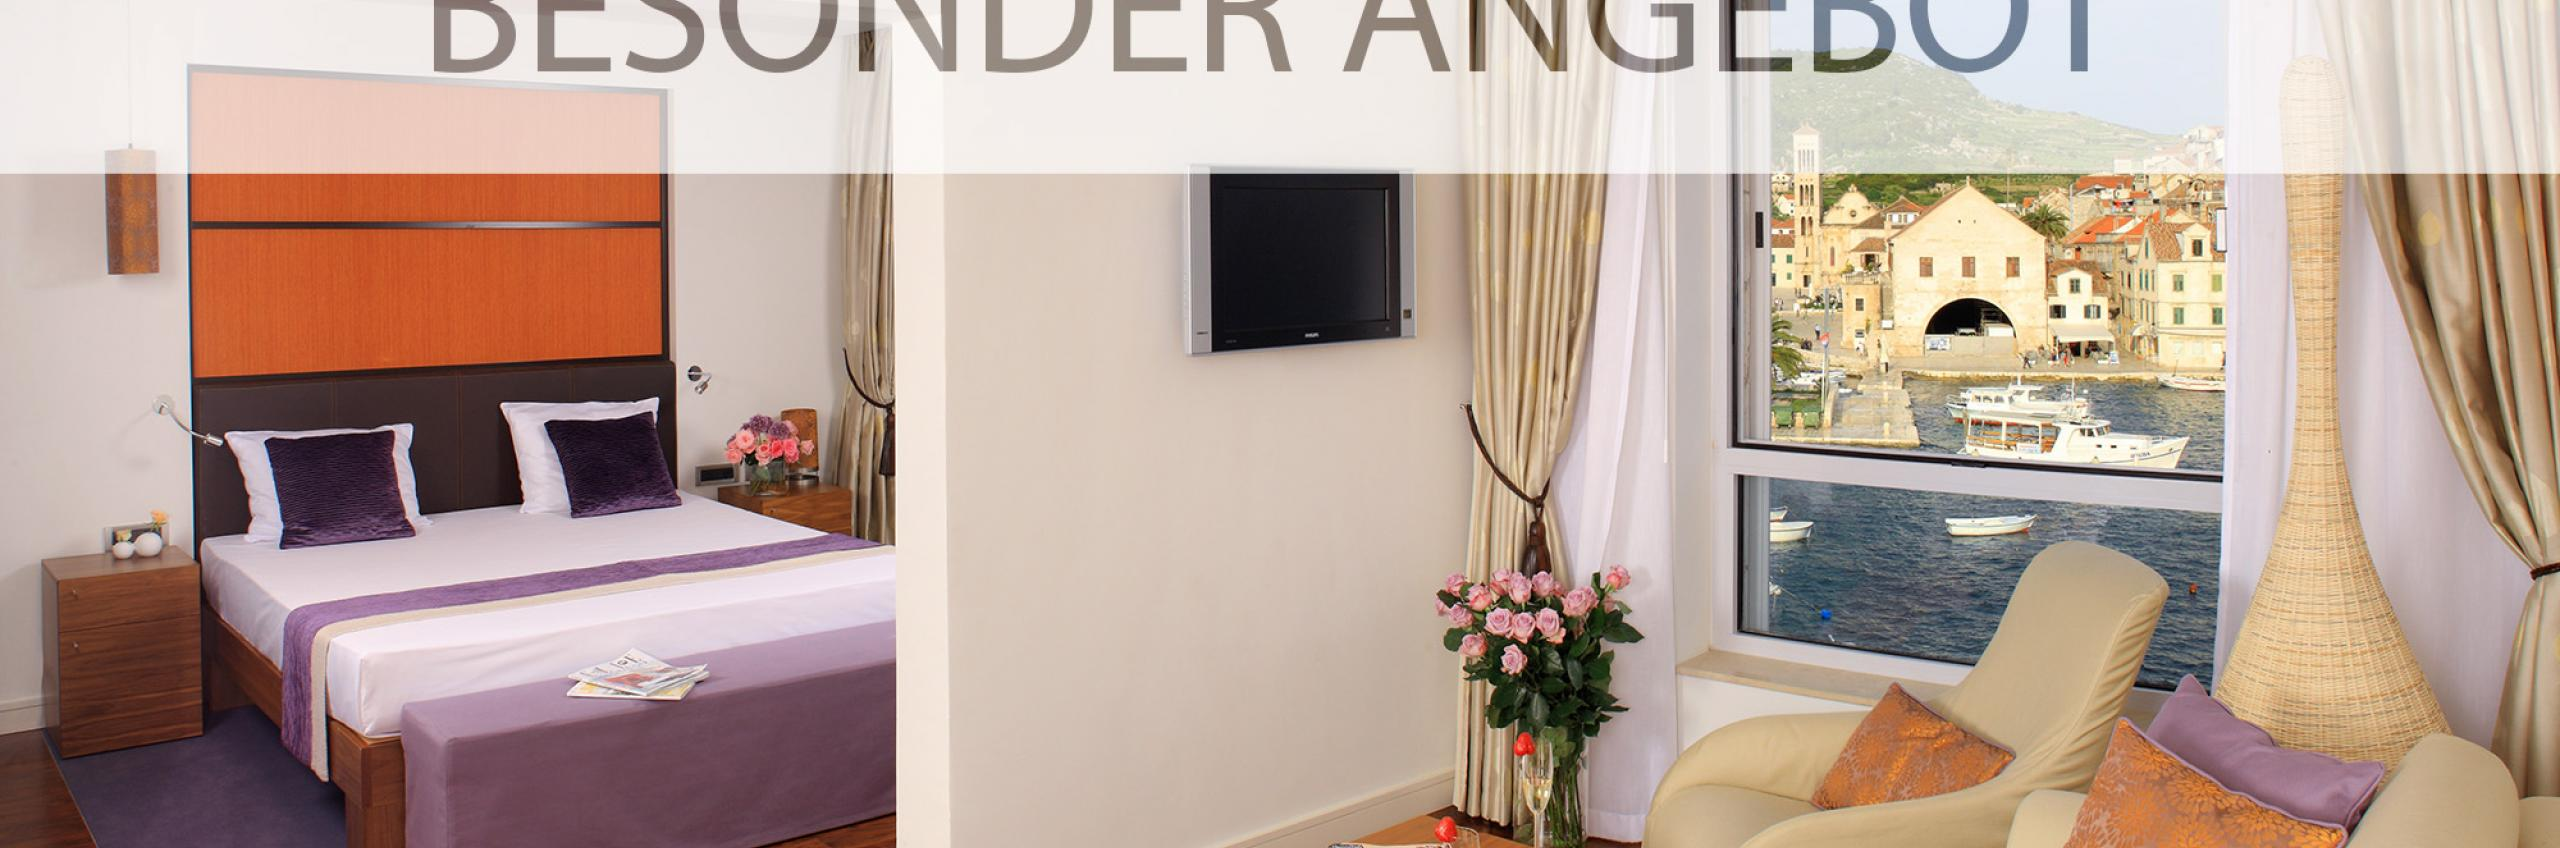 Adriana hvar spa hotel besondere angebote suncani hvar for Besondere hotels